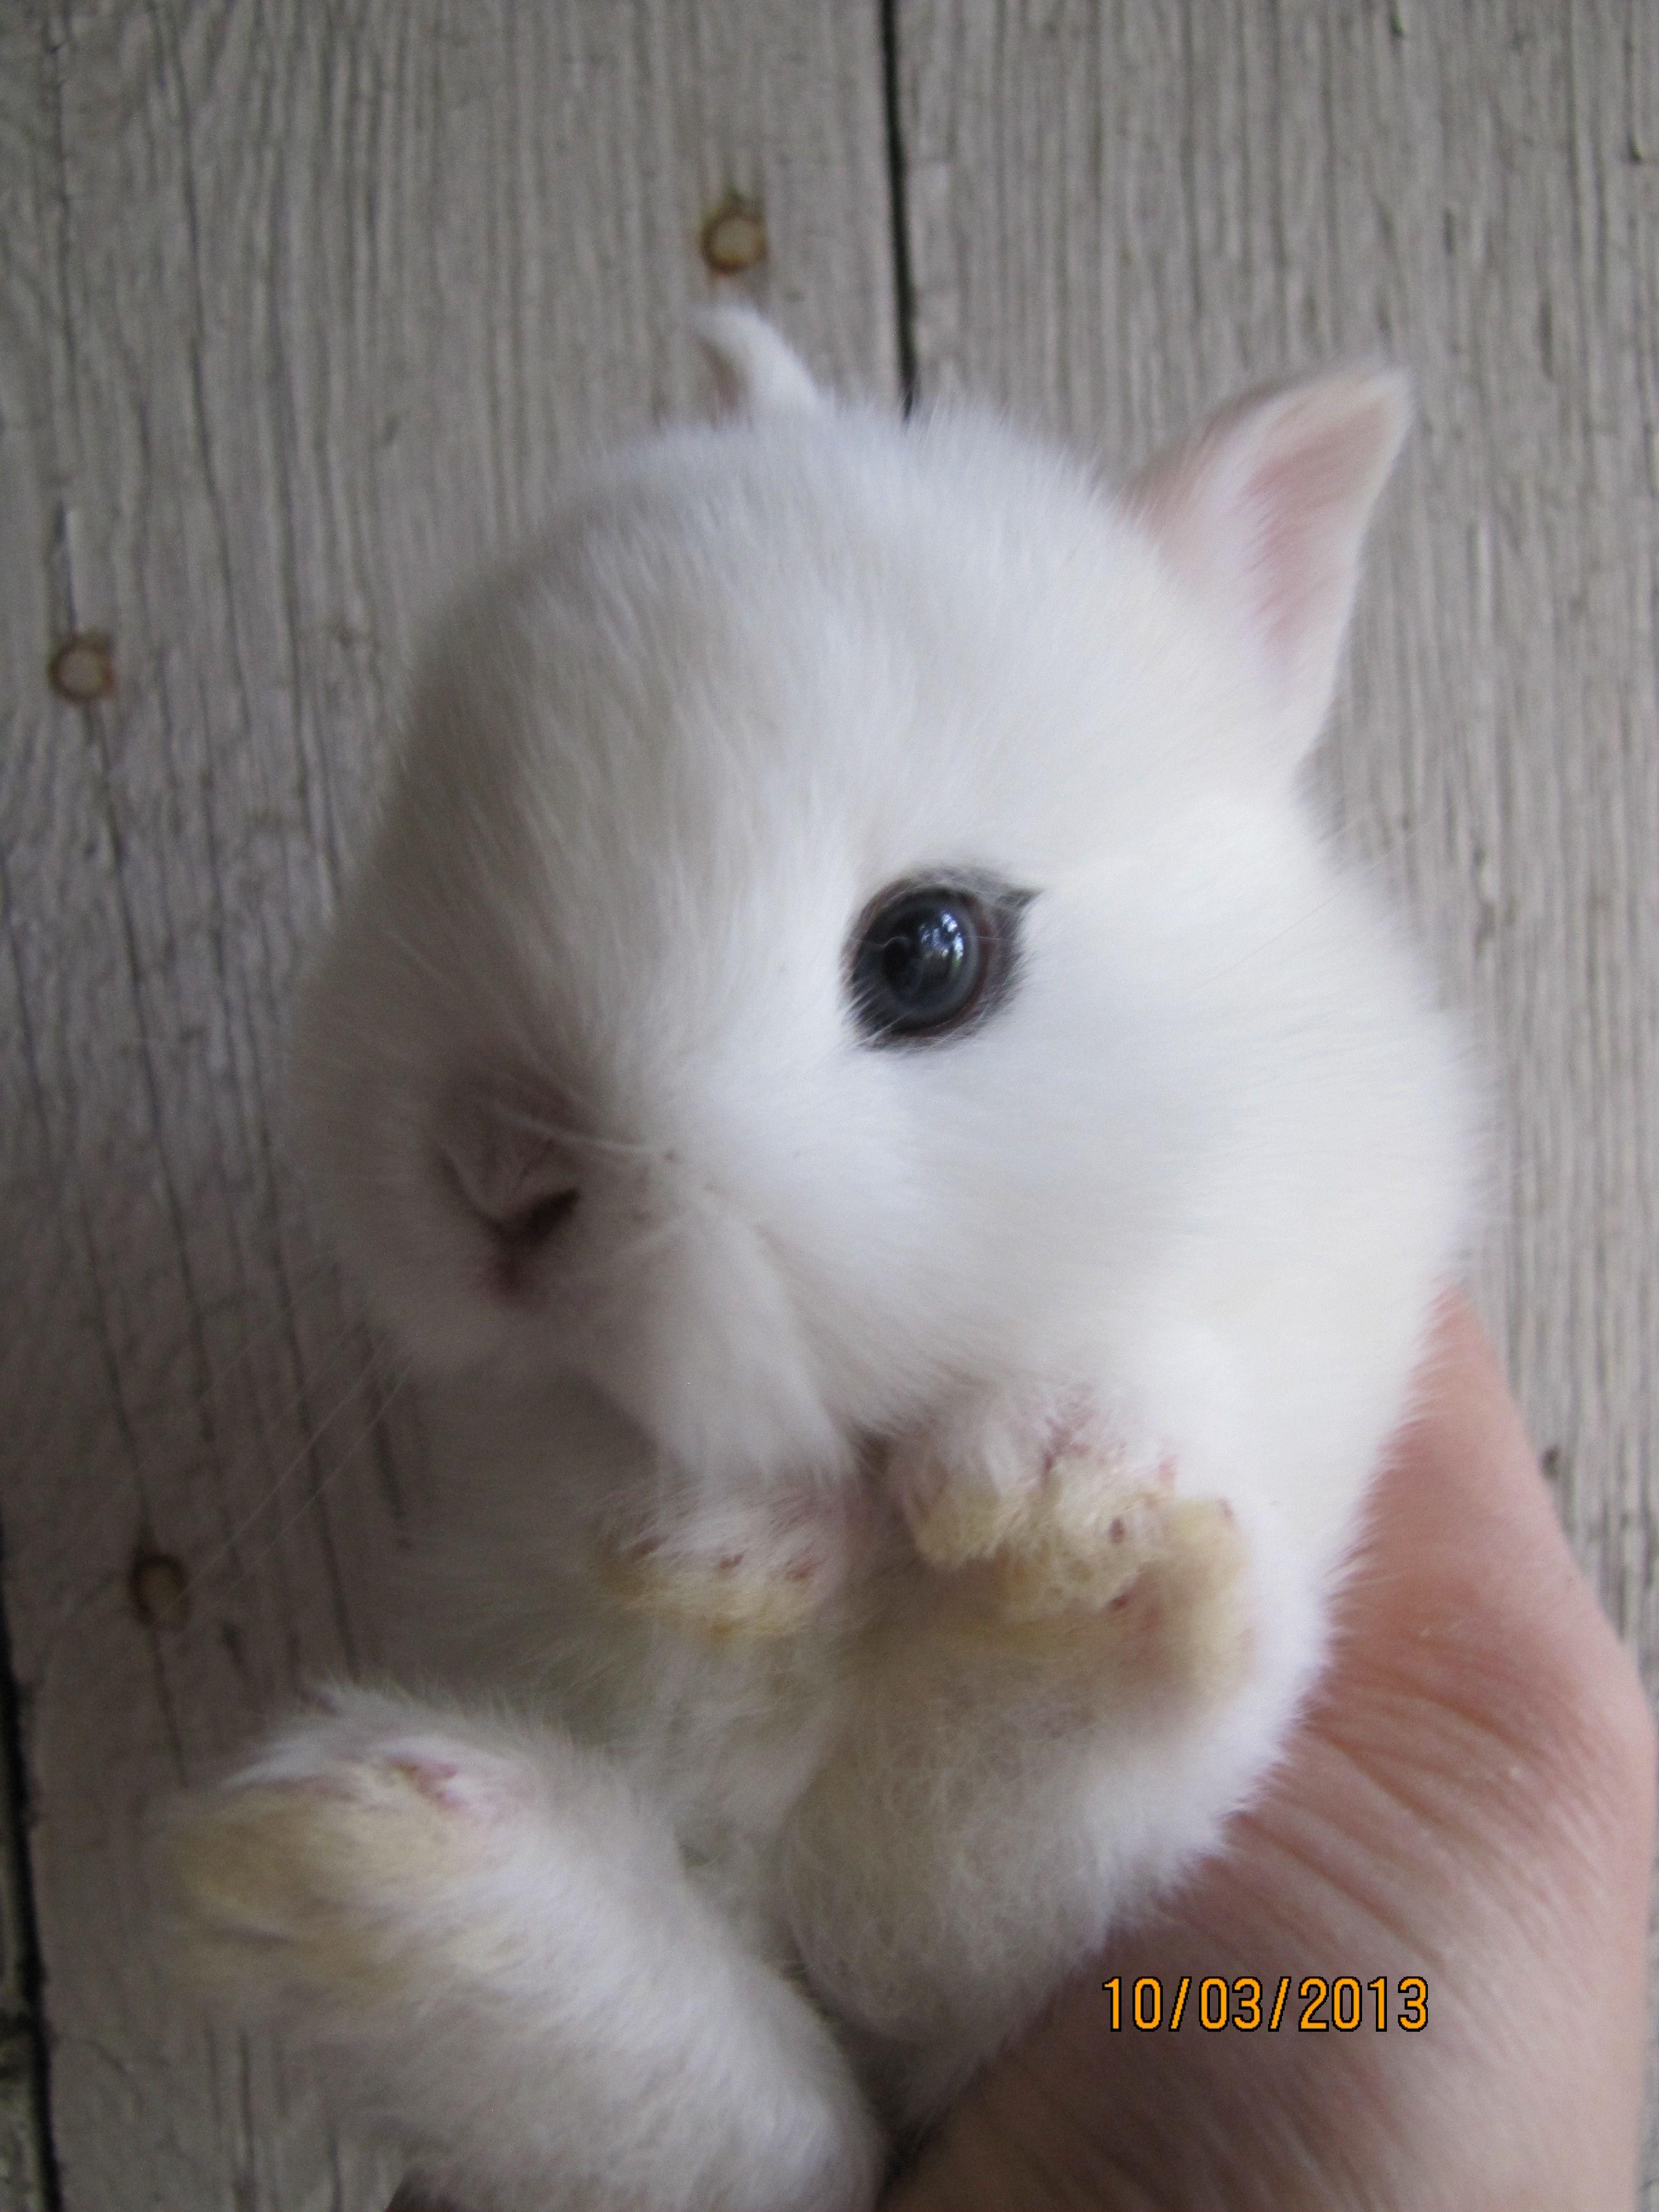 Baby Teacup Bunnies : teacup, bunnies, Dwarf, Hotot, Bunny., Cute!, Hamsters,, Animals,, Bunny